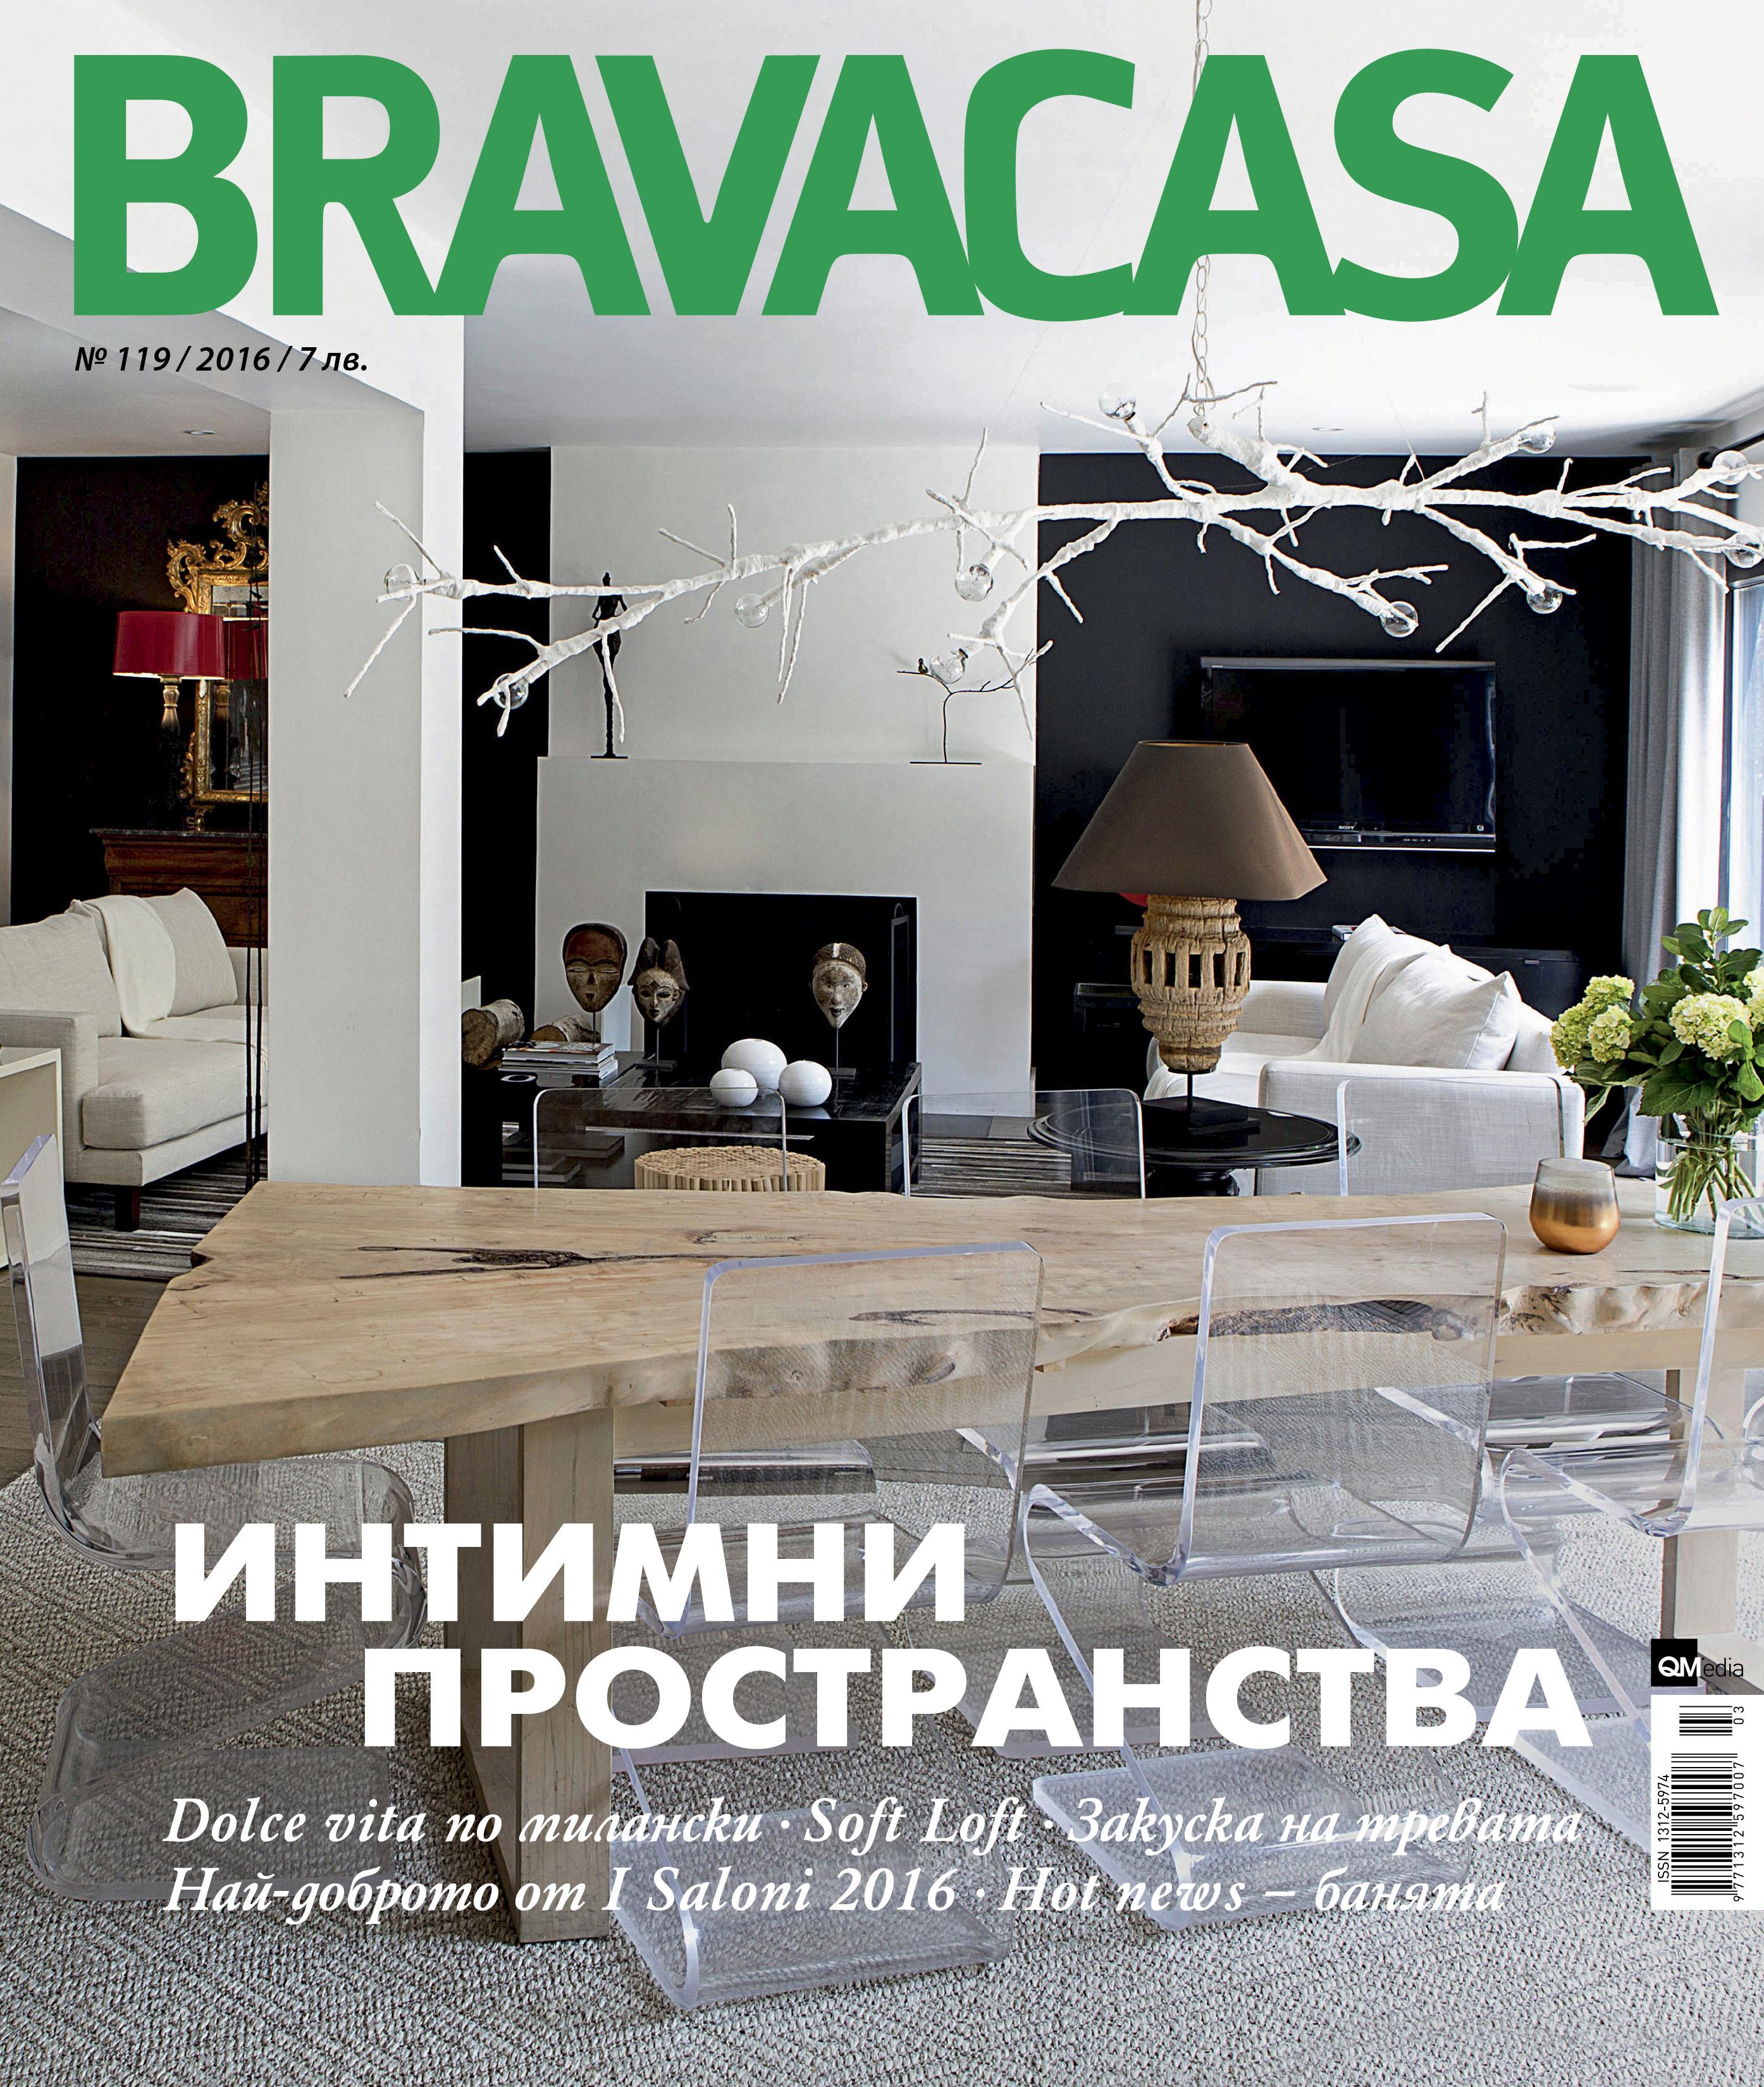 Bravacasa Bulgaria